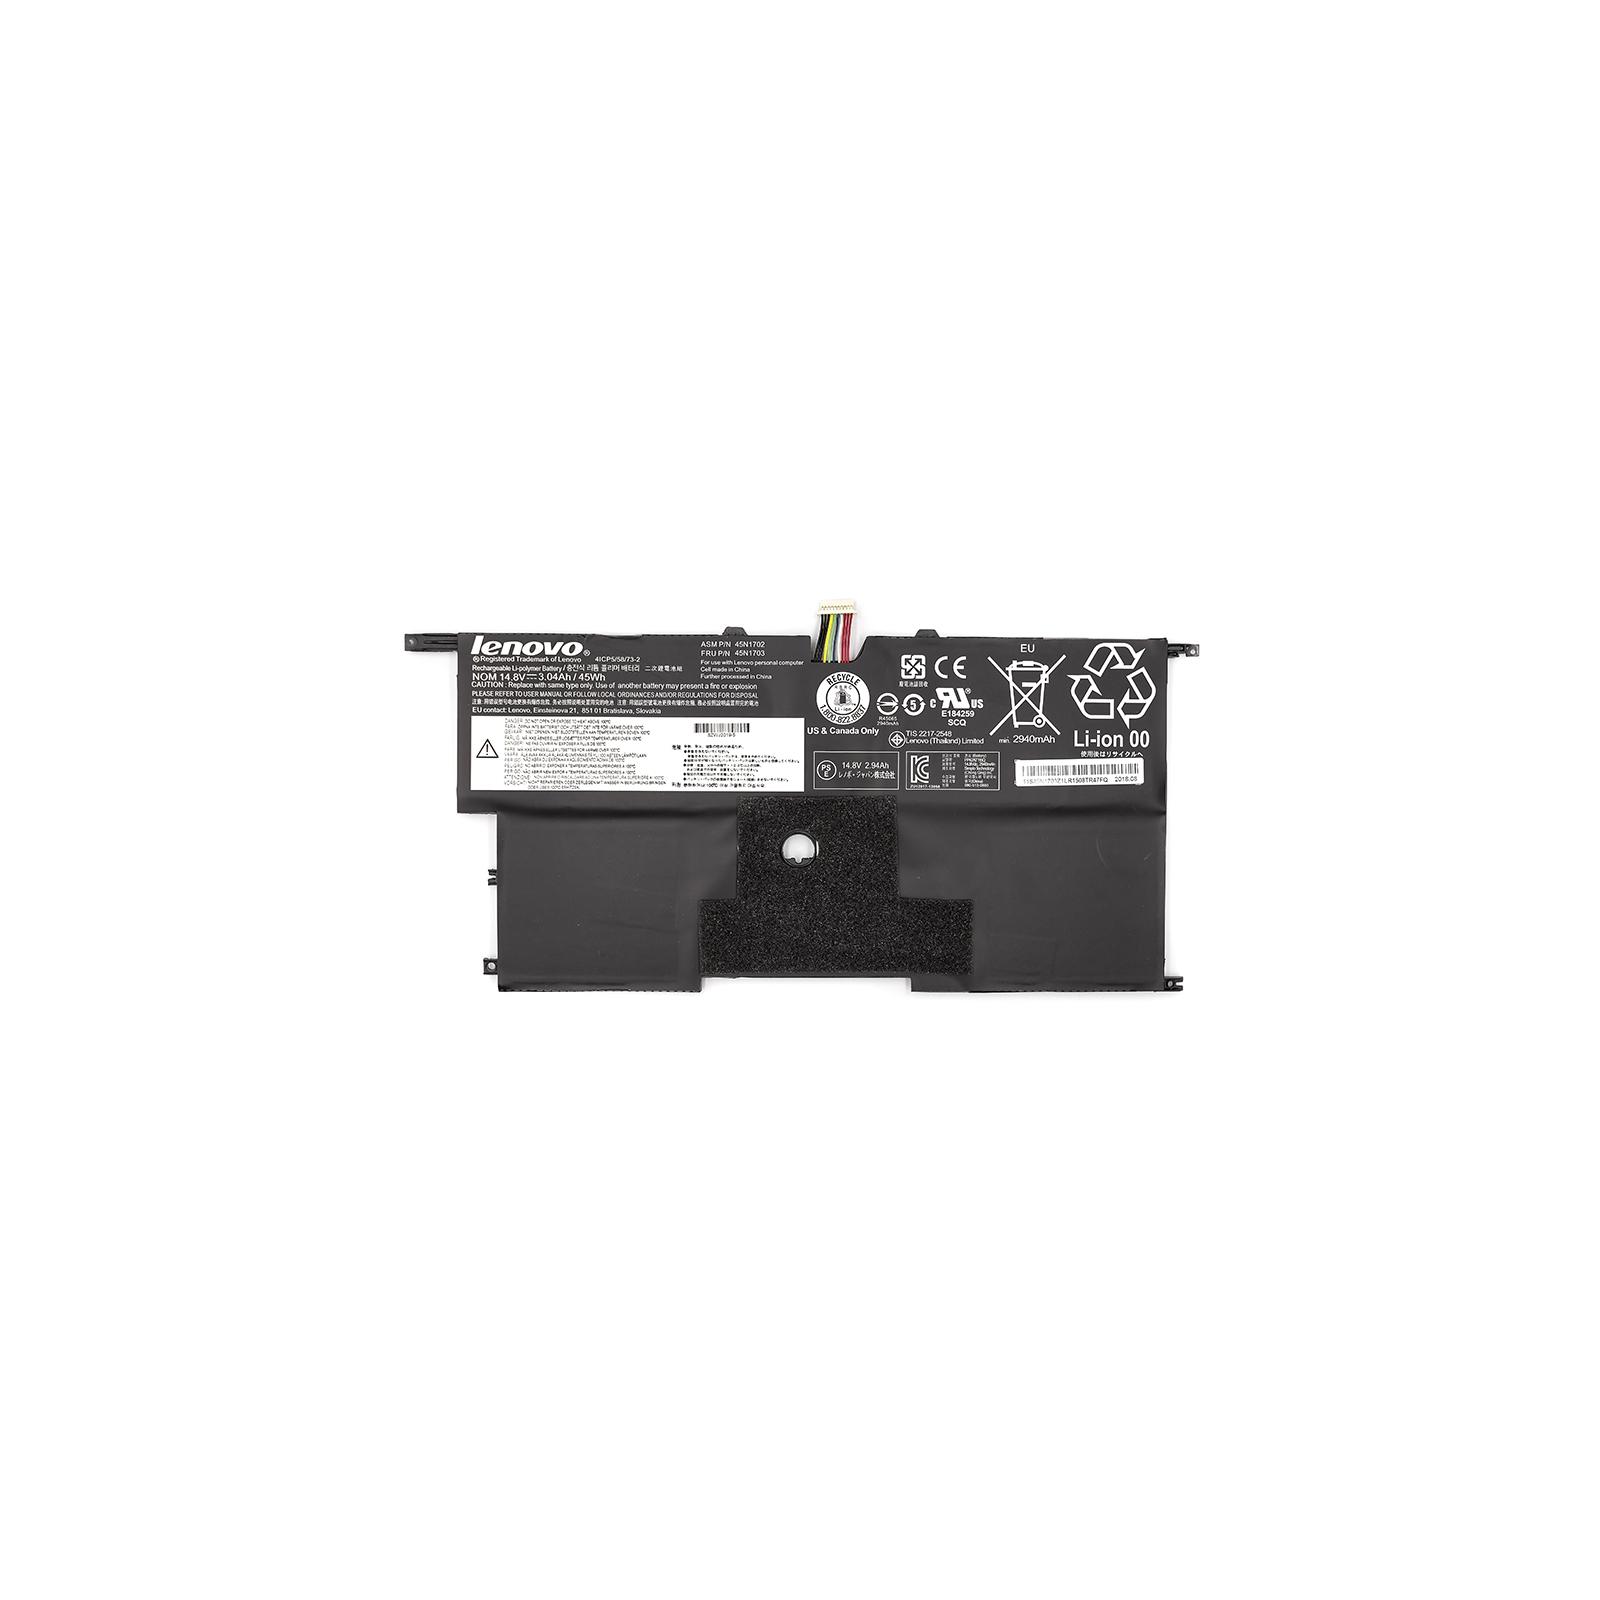 "Аккумулятор для ноутбука Lenovo ThinkPad X1 Carbon 14"" 2nd (45N1700) 14.8V 45Wh (NB480678) изображение 2"